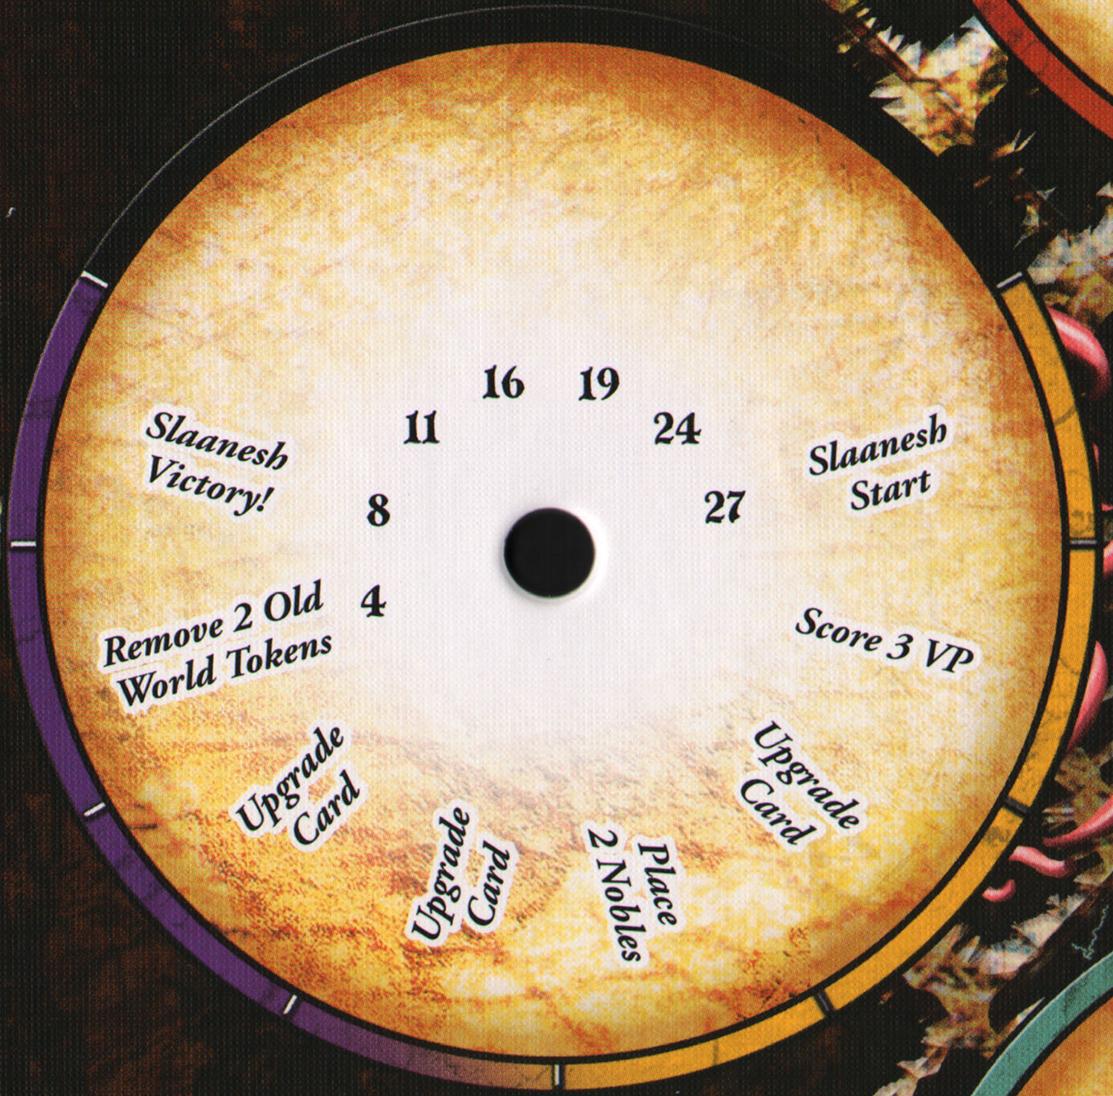 Slaanesh's dial